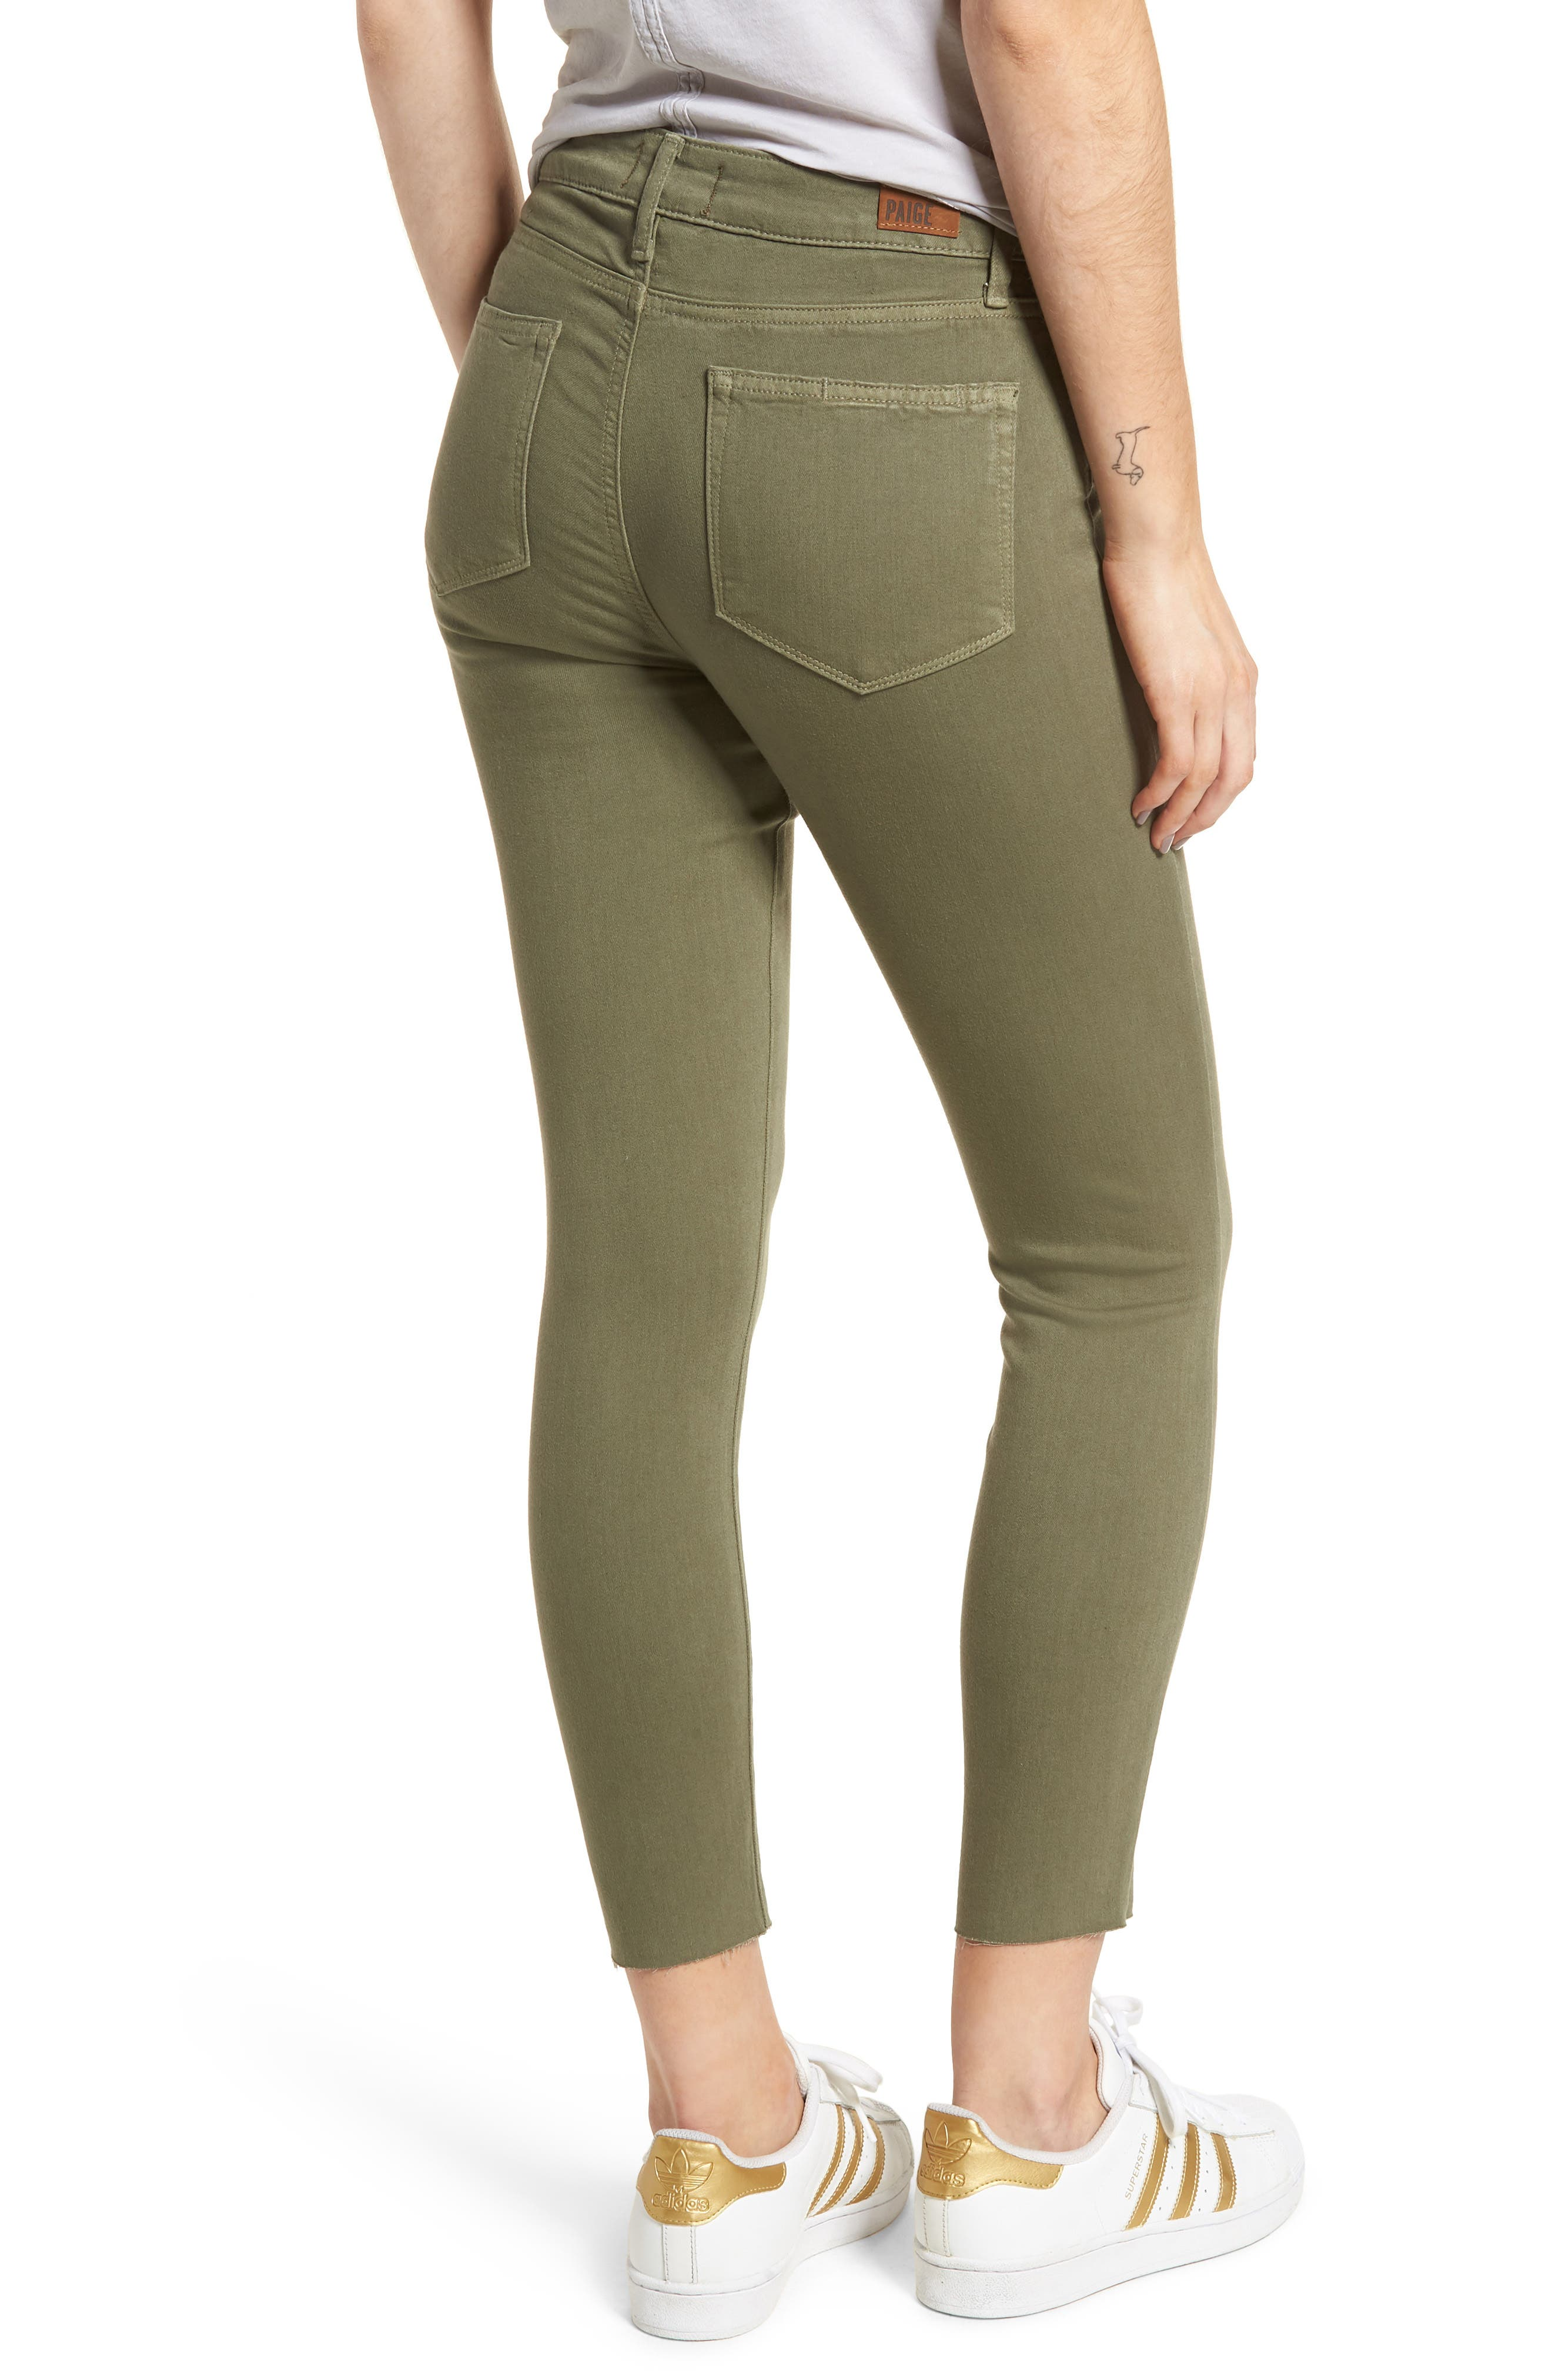 Hoxton Transcend High Waist Crop Skinny Jeans,                             Alternate thumbnail 2, color,